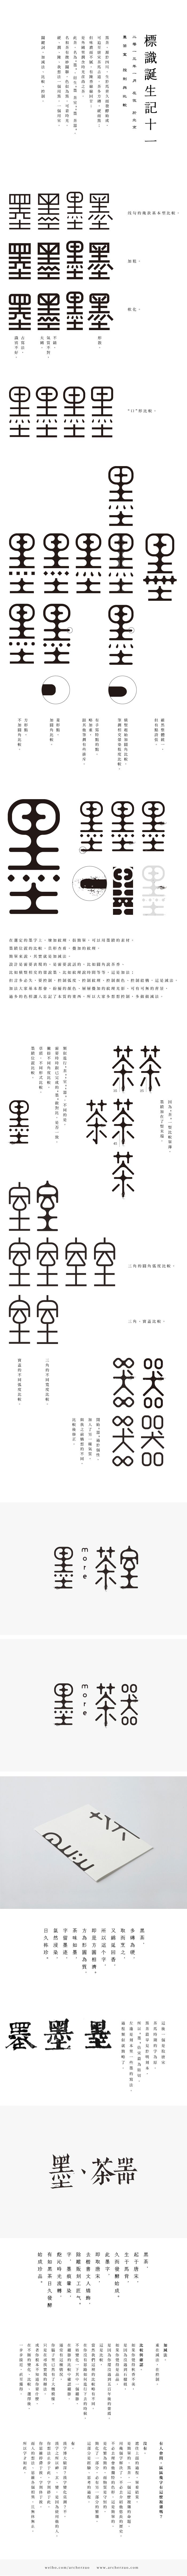 archerzuo / 墨茶室